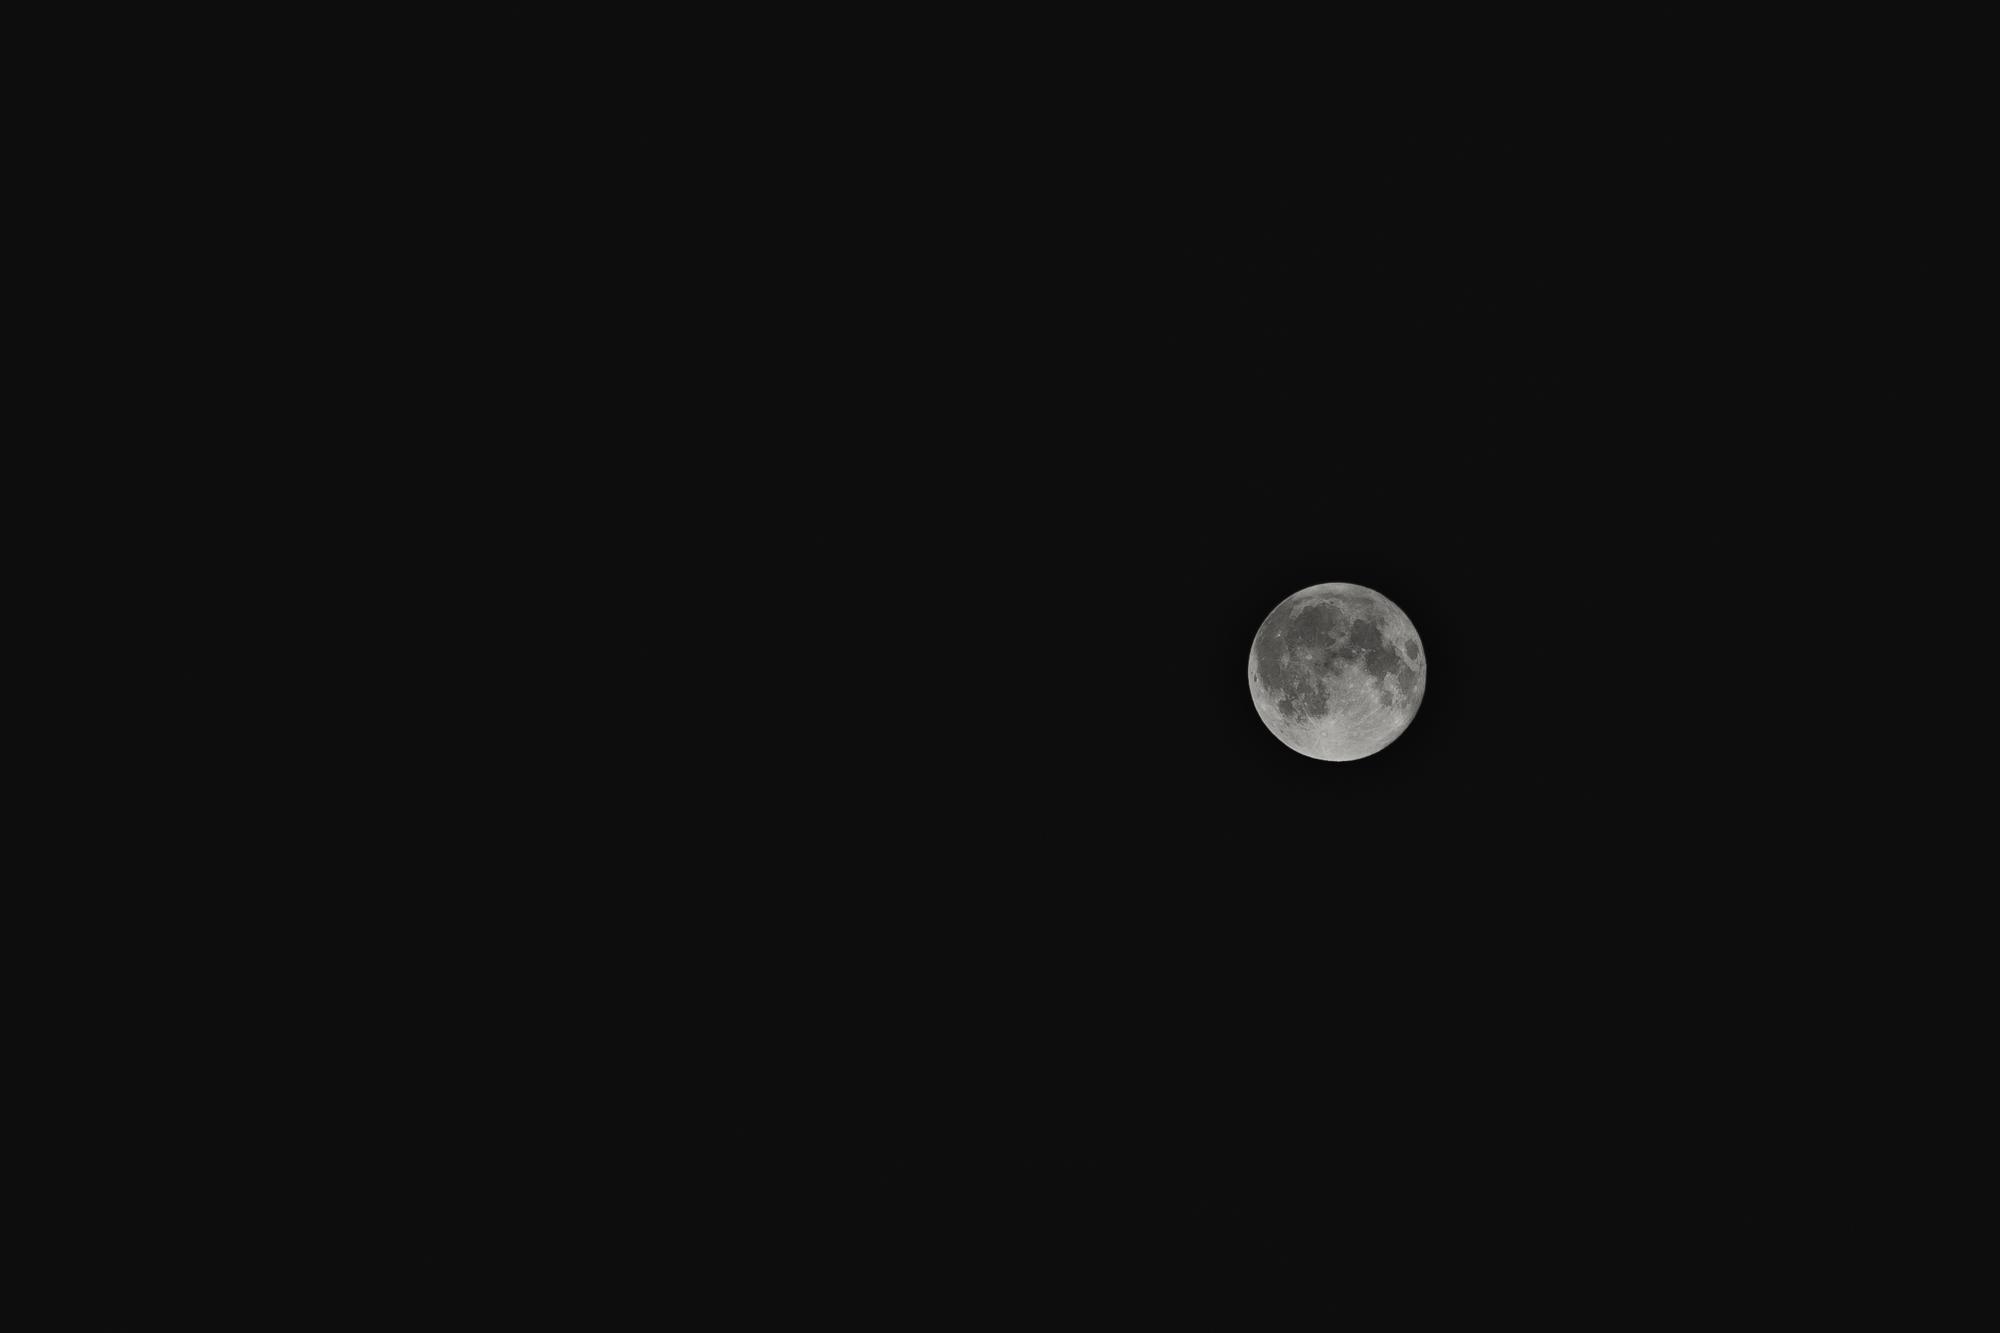 www.sarakrebsbach.com_full moon-1.jpg